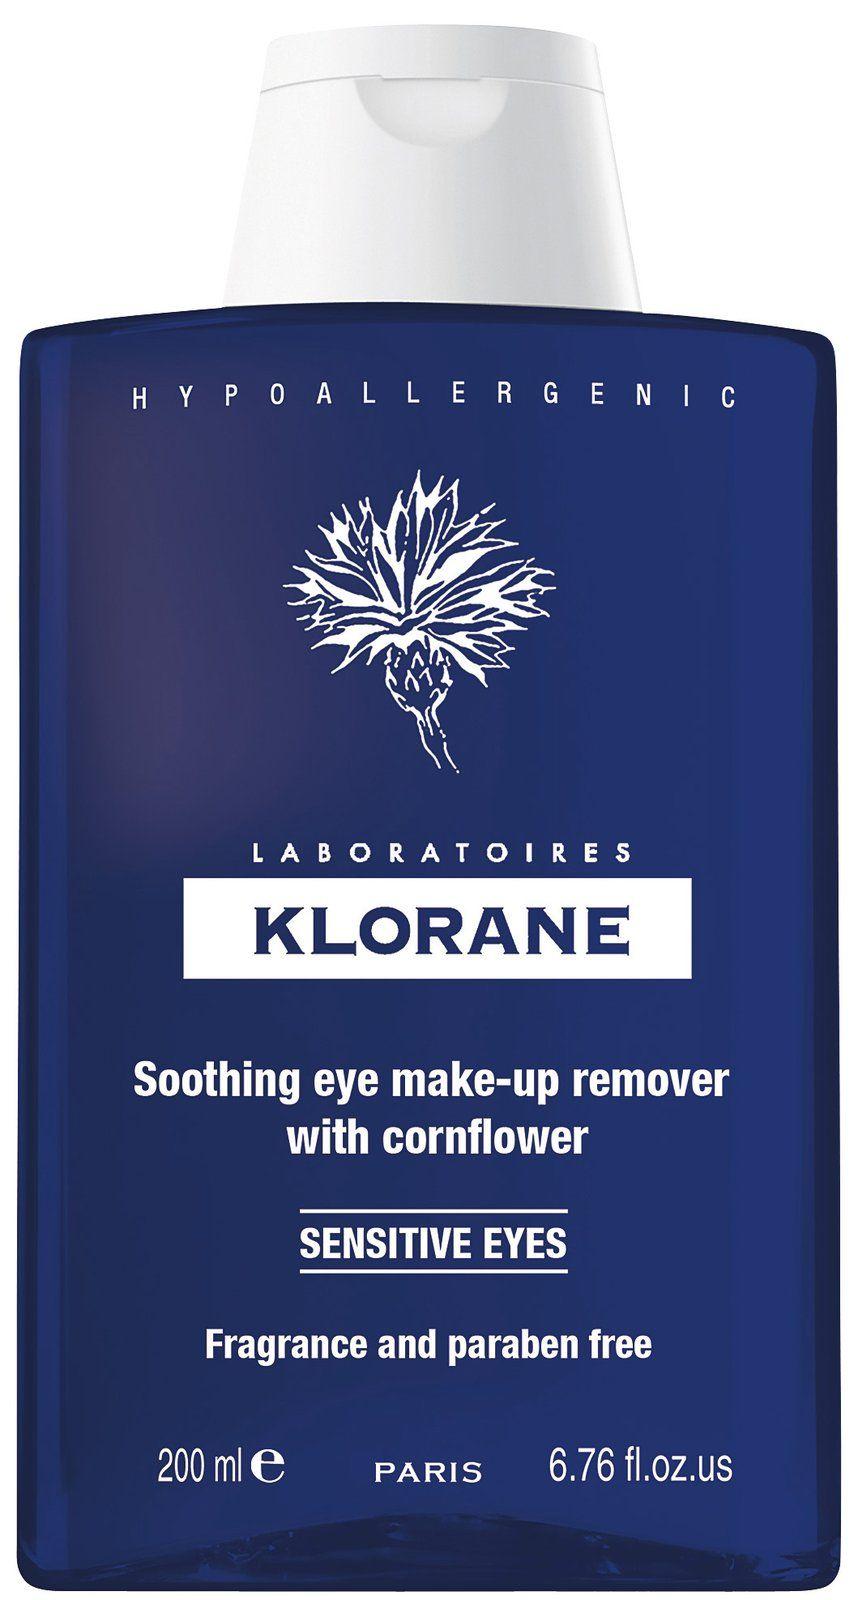 Klorane Soothing Eye MakeUp Remover with Cornflower Eye